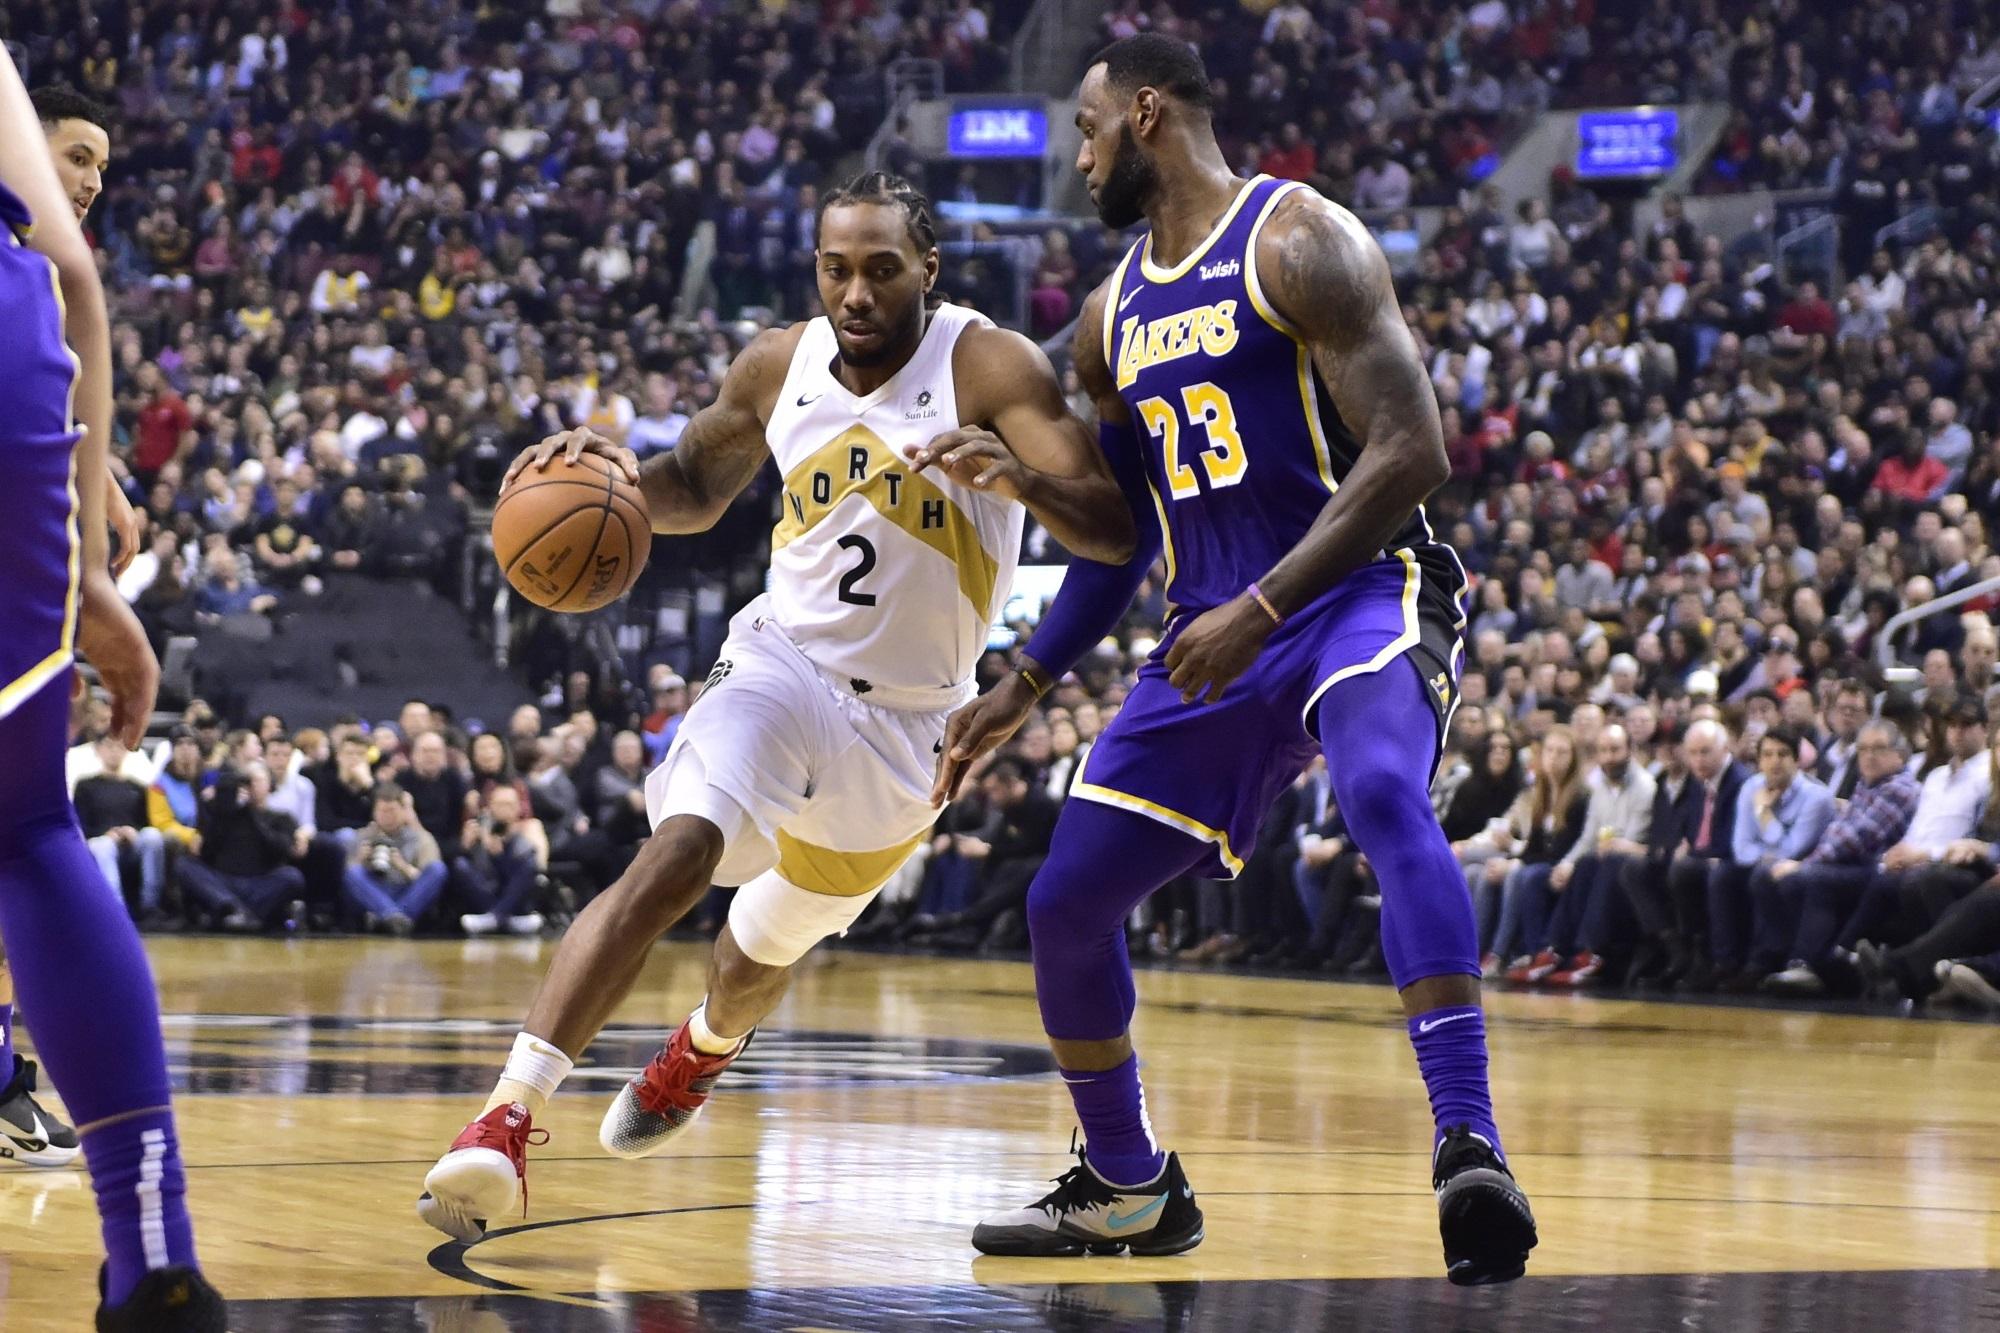 LeBron James and Kawhi Leonard, Los Angeles Lakers vs Toronto Raptors at Scotiabank Arena